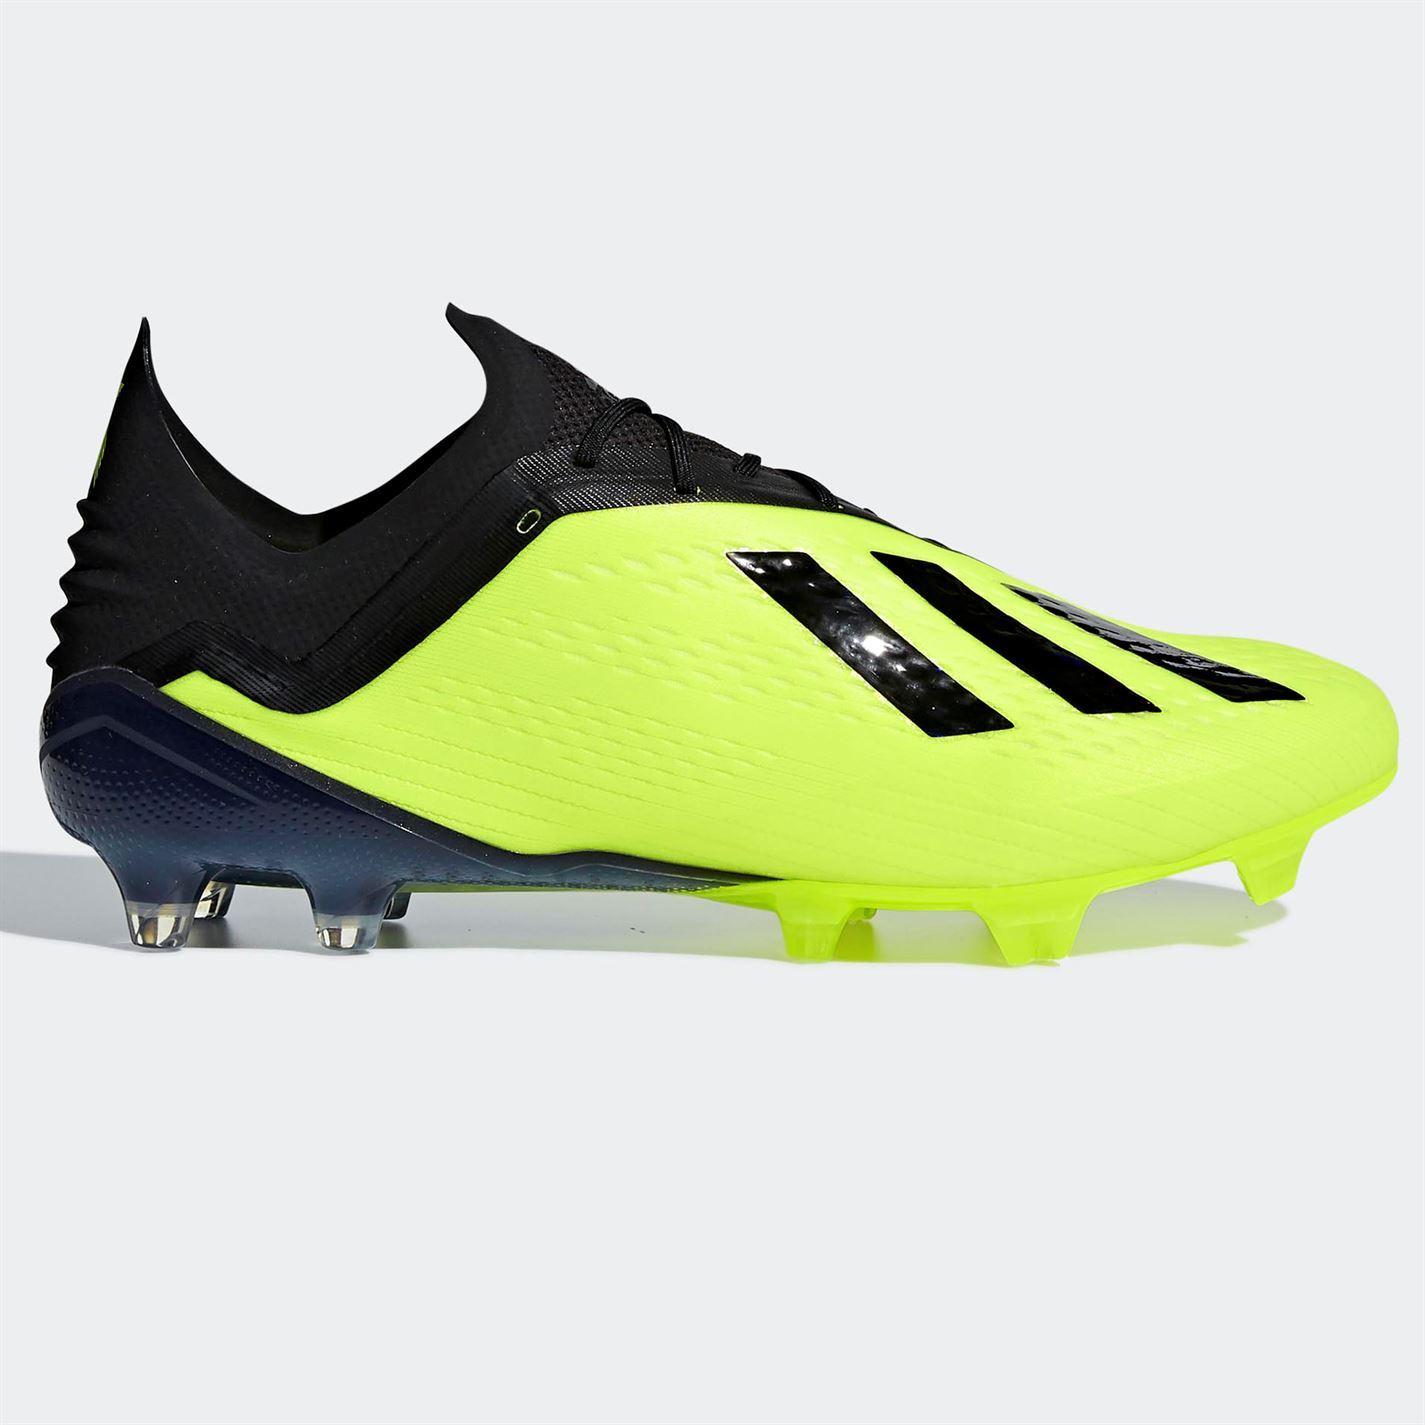 Adidas-x-18-1-FG-Firm-Ground-Chaussures-De-Football-Homme-Football-Chaussures-Crampons miniature 4